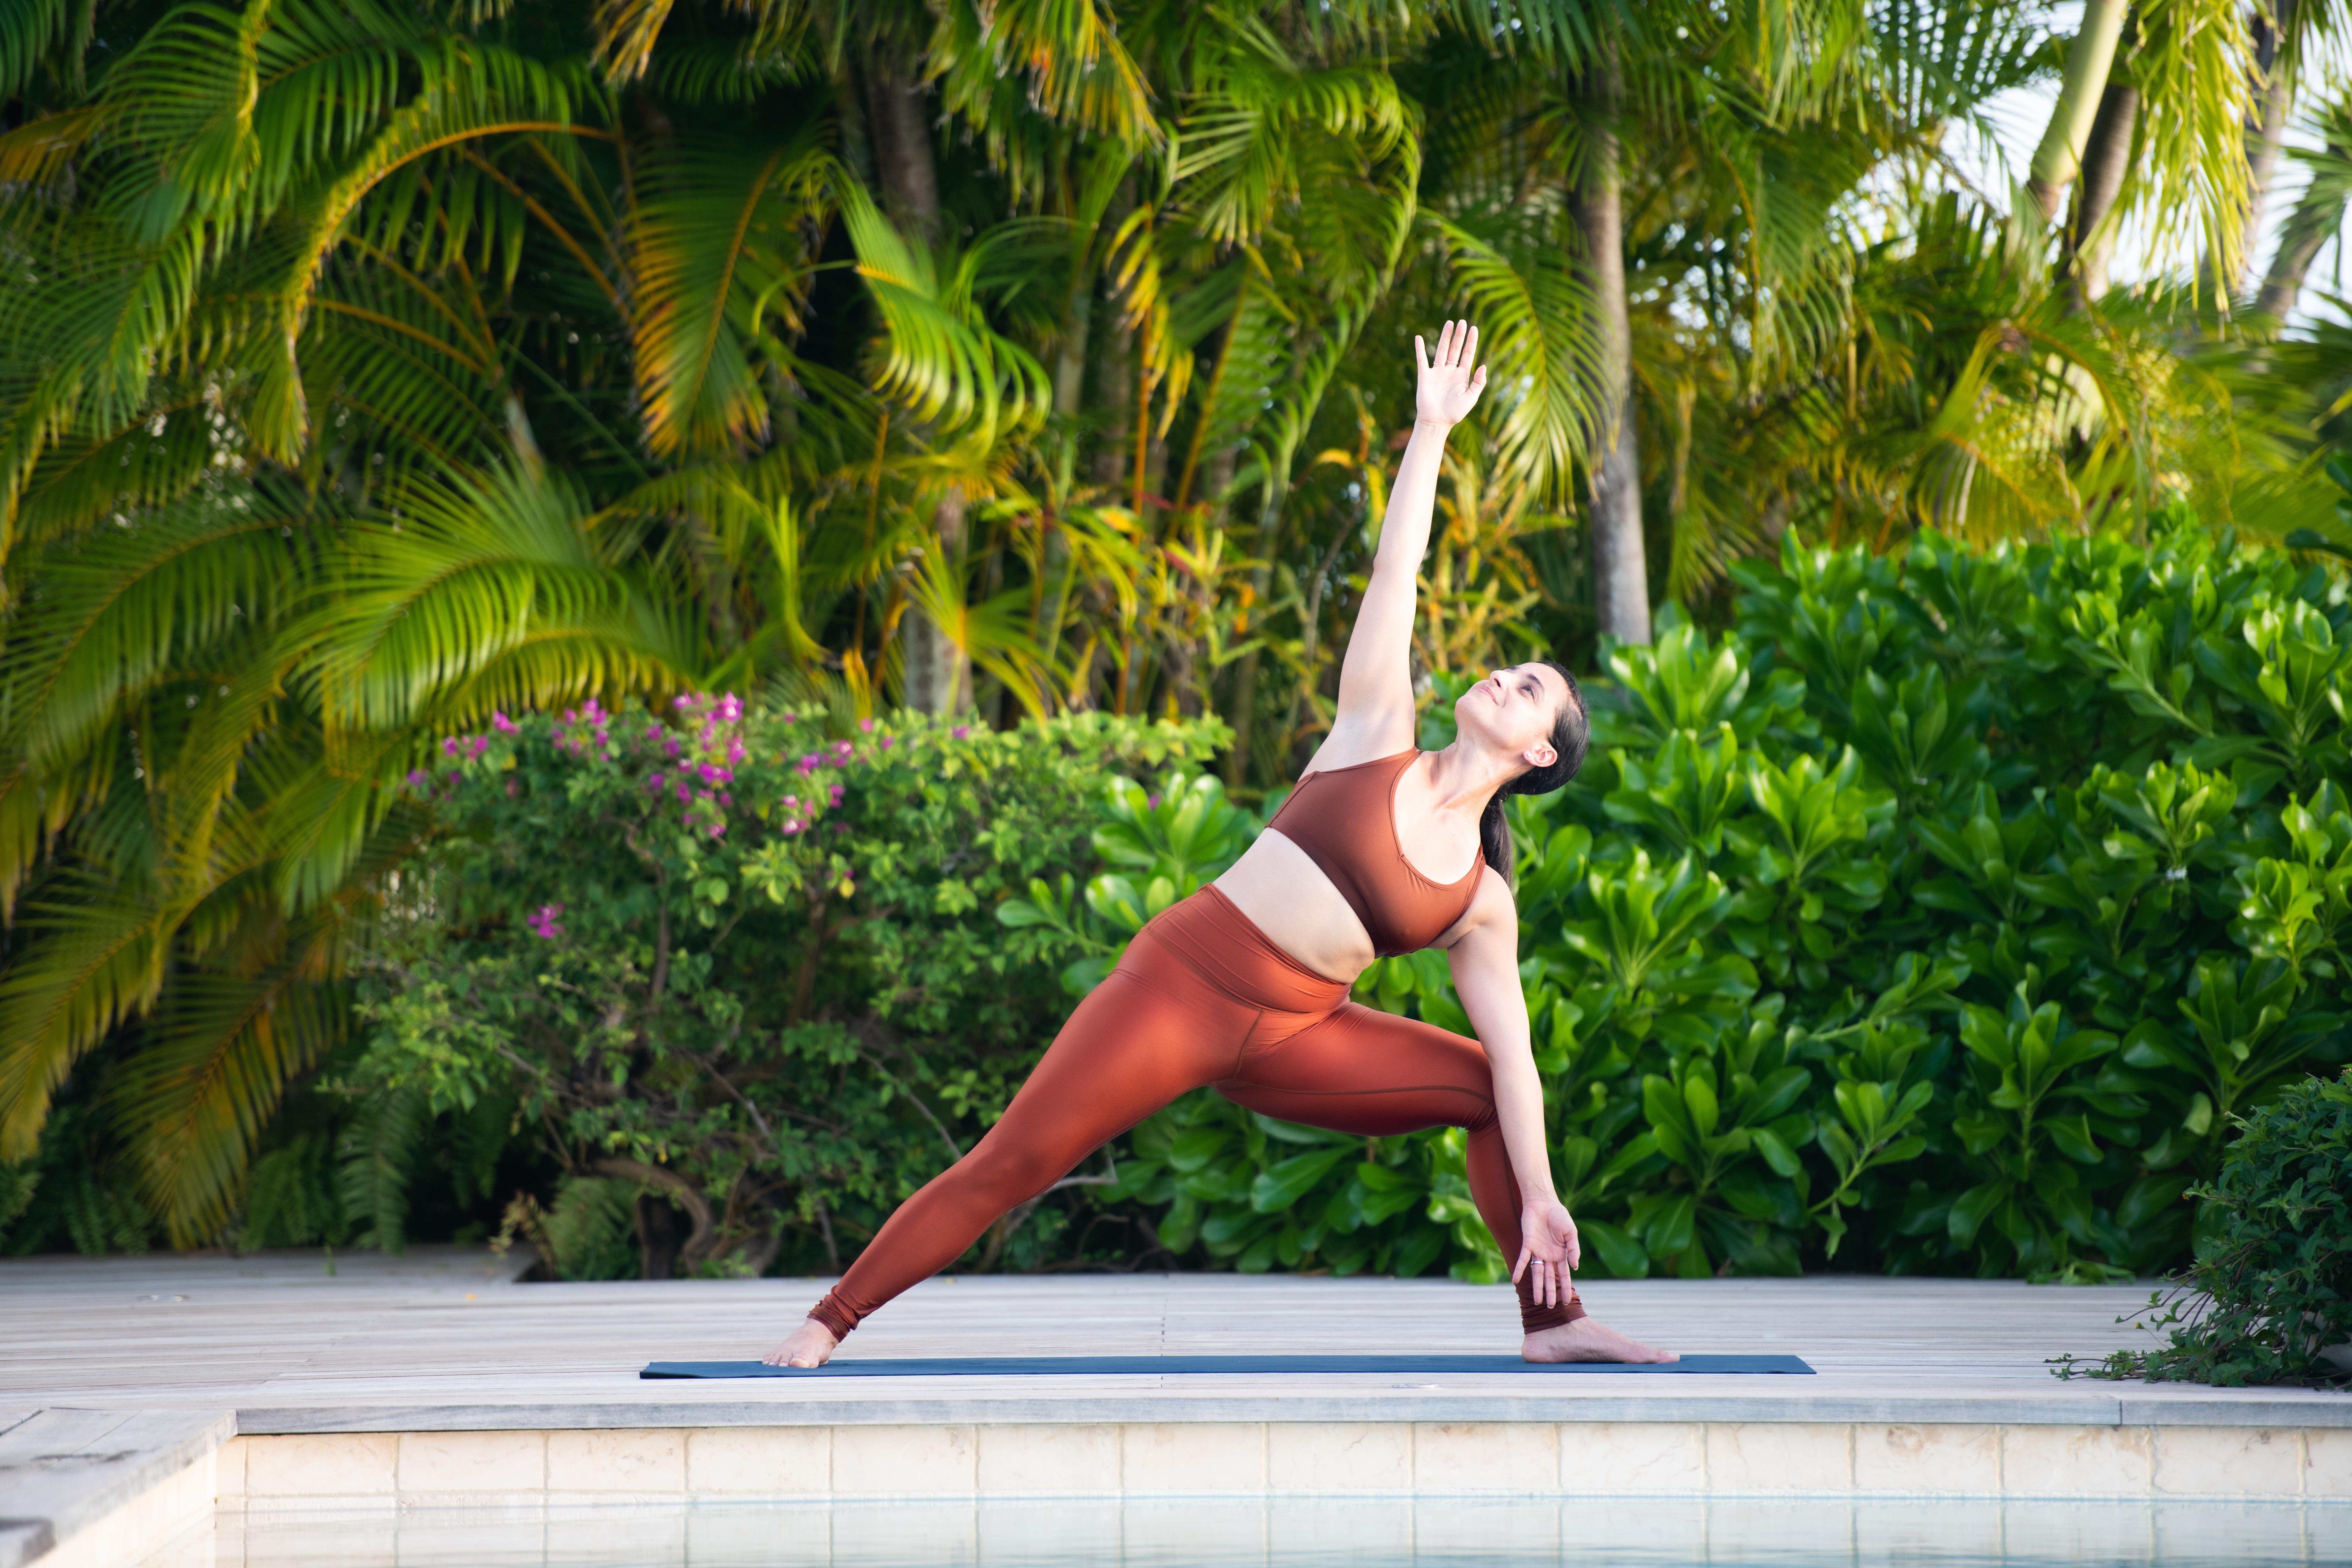 Instructor doing yoga pose